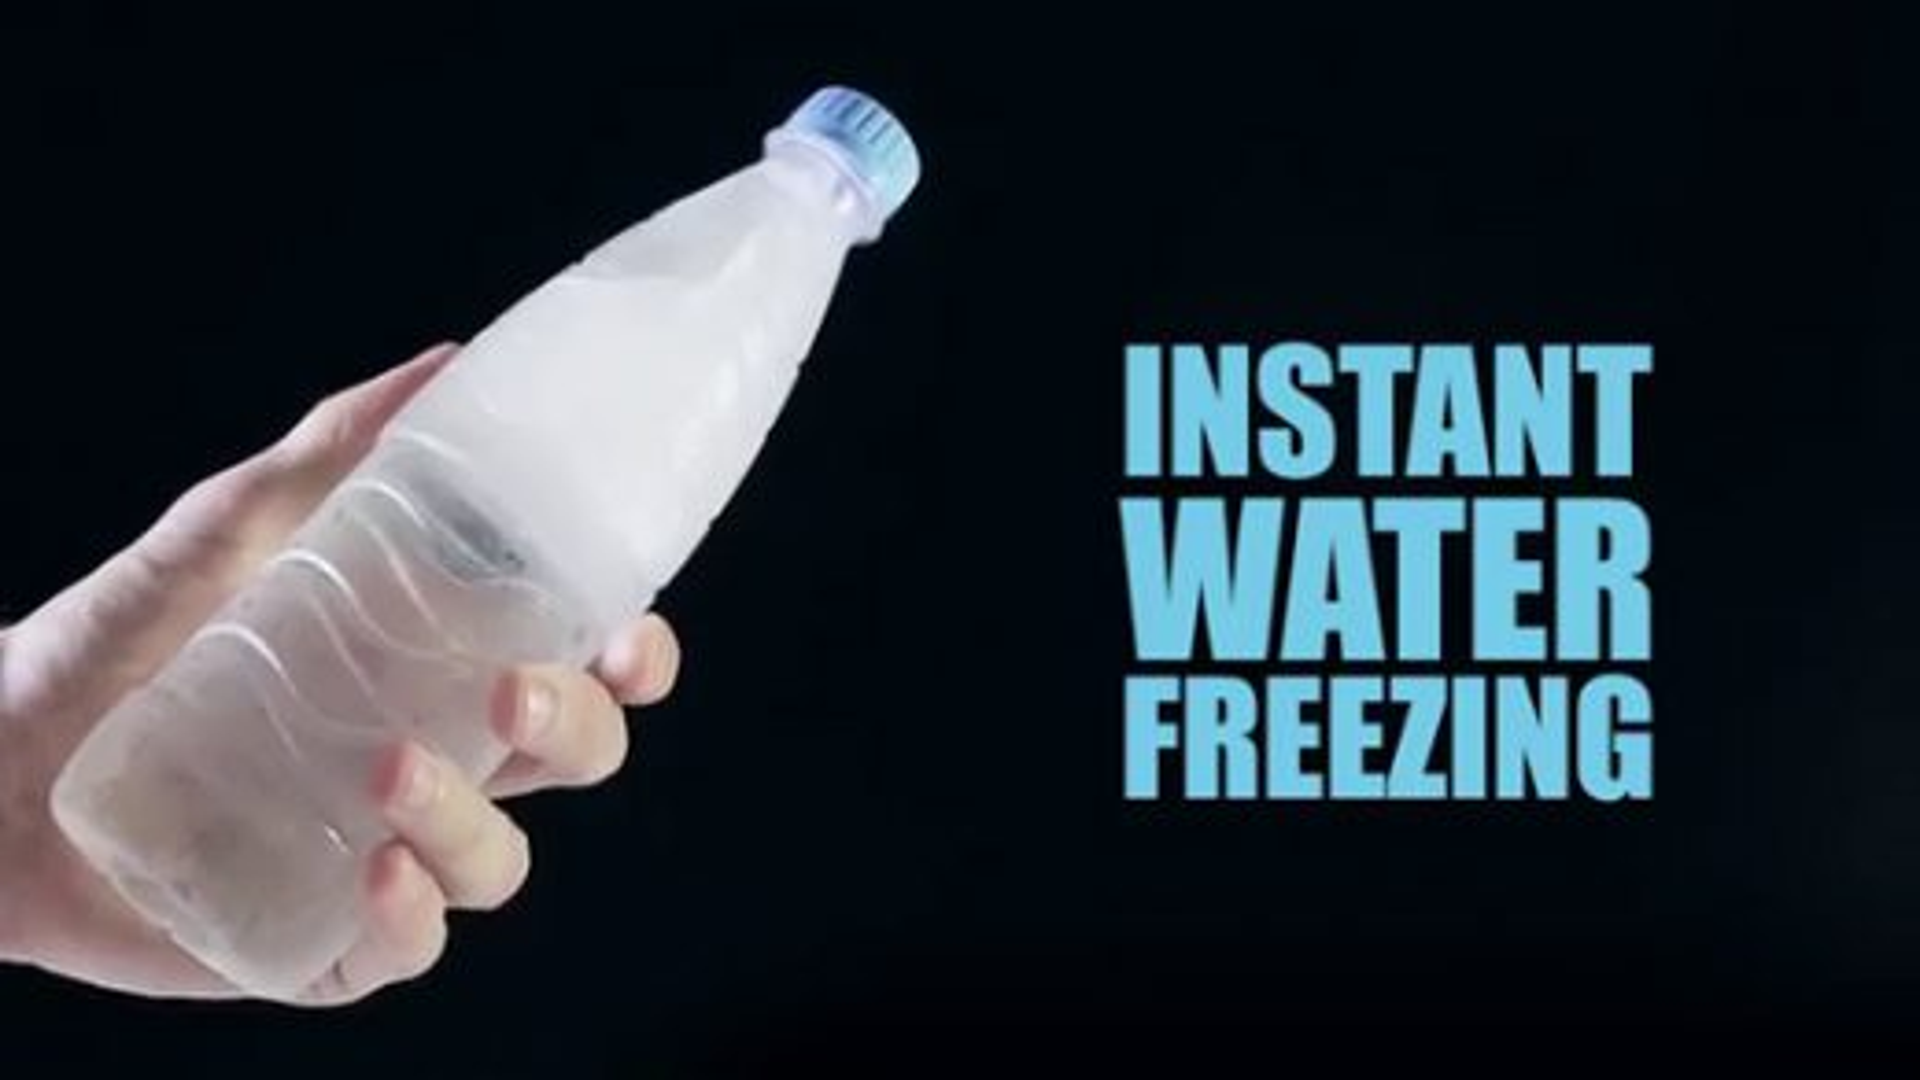 ترفند یخ زدن سریع آب | تگ